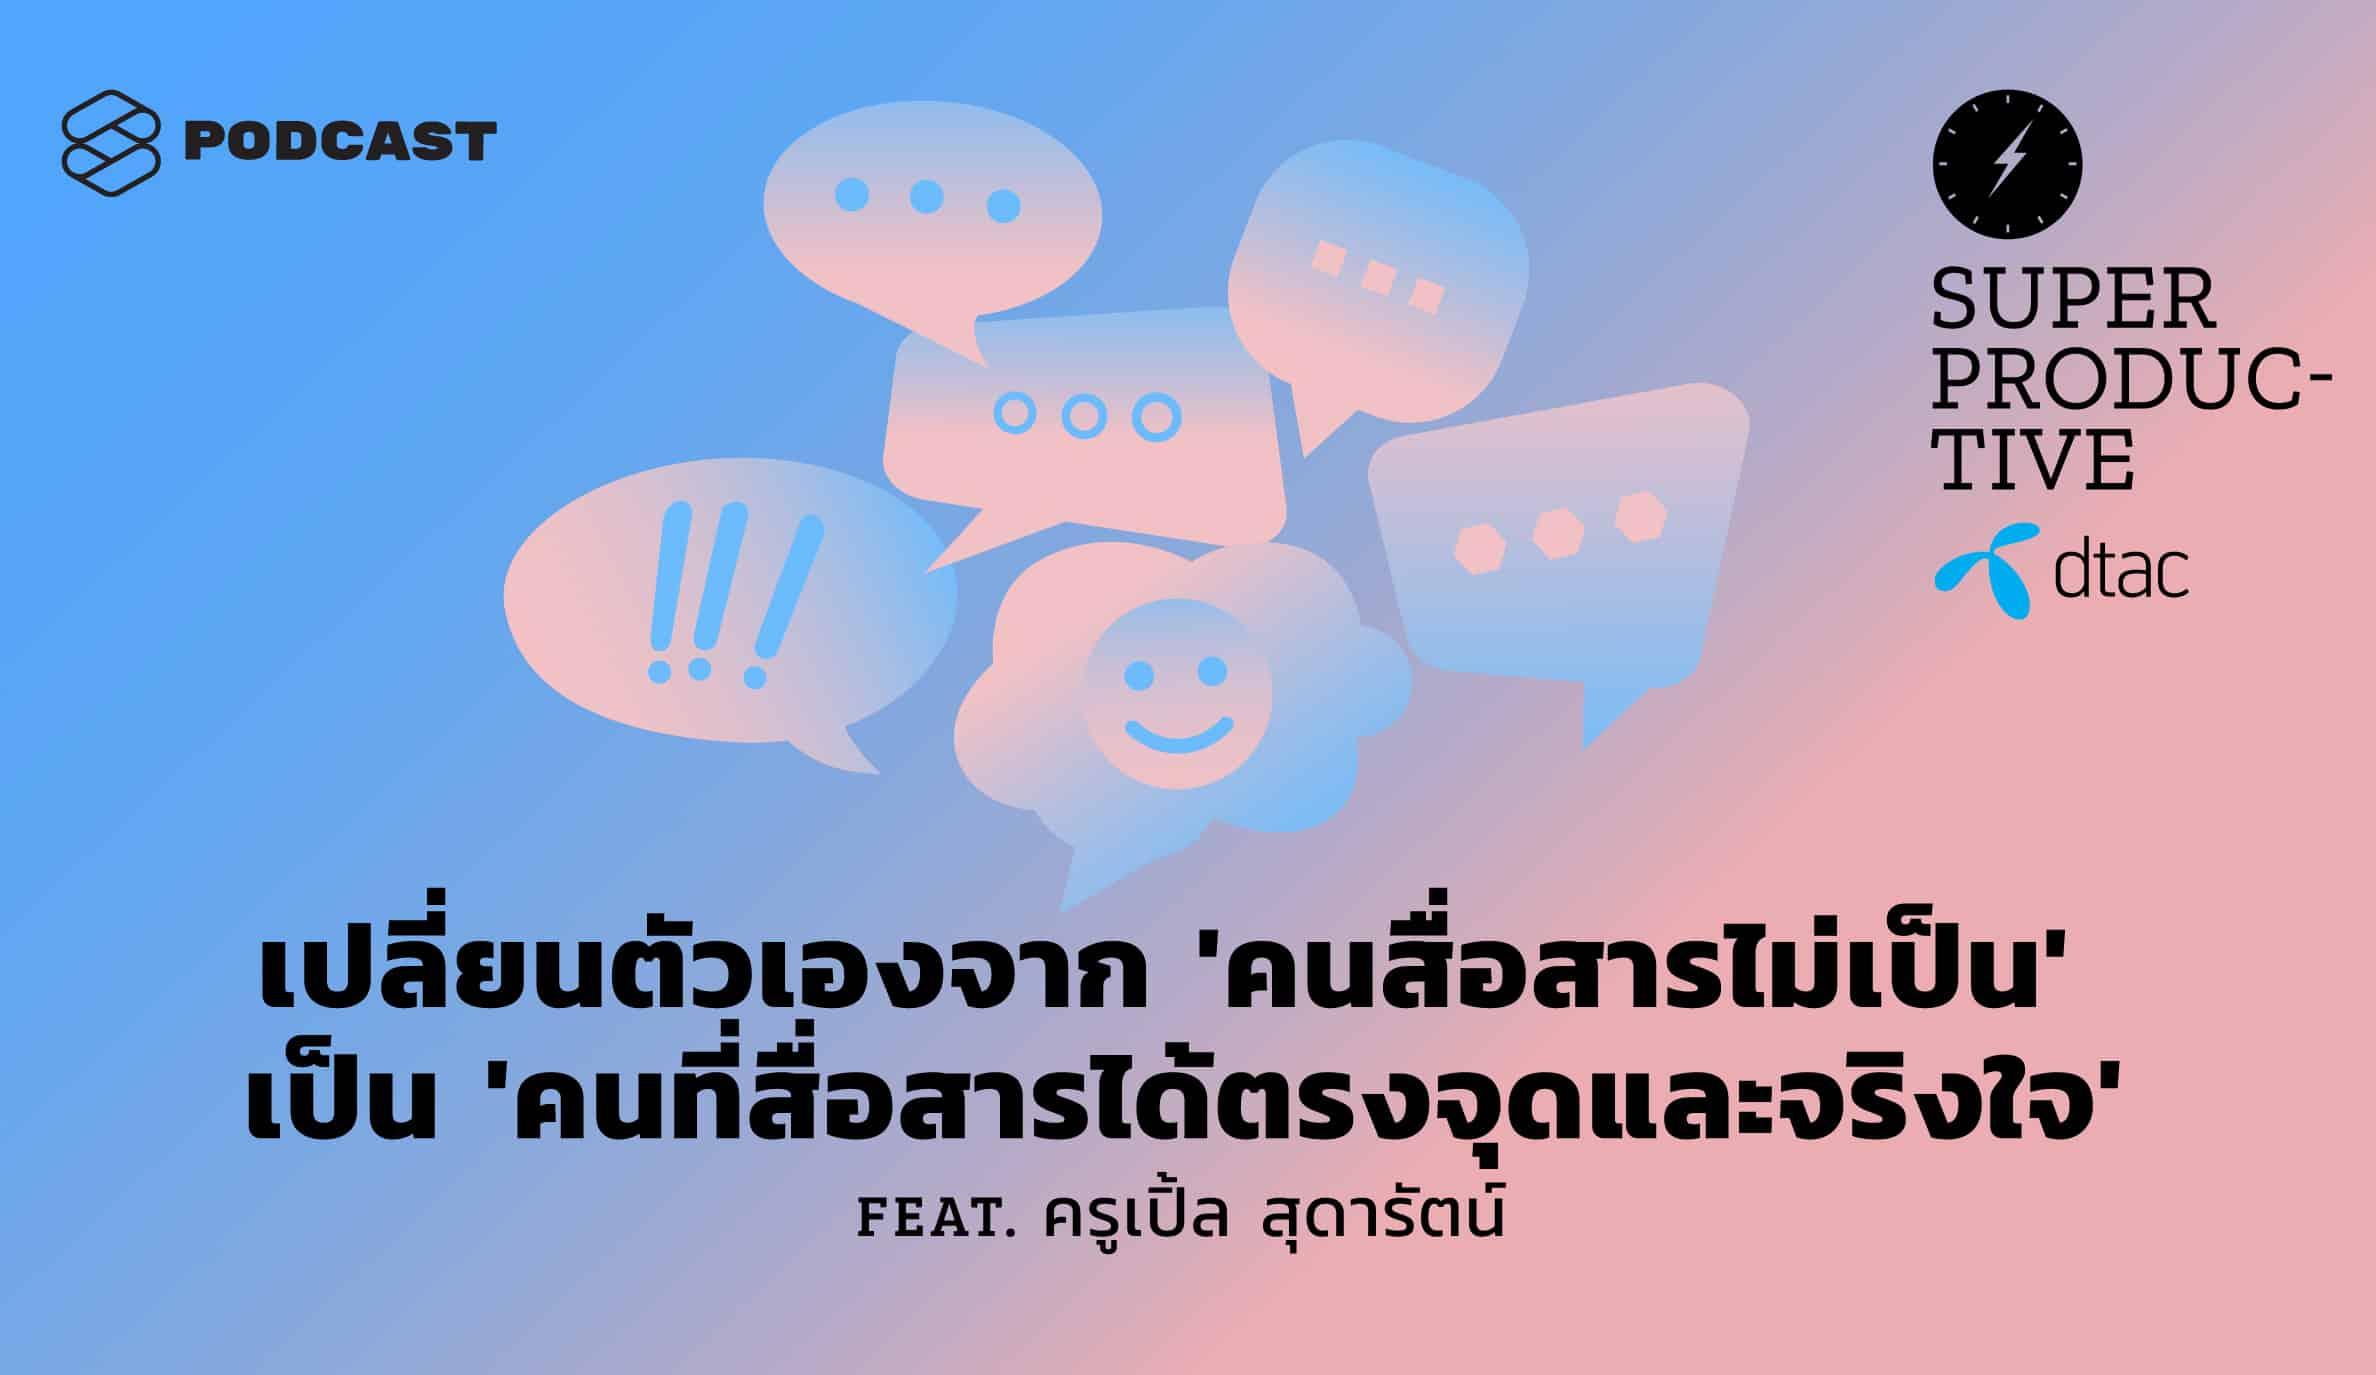 SUPER PRODUCTIVE EP.21 เปลี่ยนตัวเองจาก 'คนสื่อสารไม่เป็น' เป็น 'คนที่สื่อสารได้ตรงจุดและจริงใจ' Feat. ครูเปิ้ล สุดารัตน์